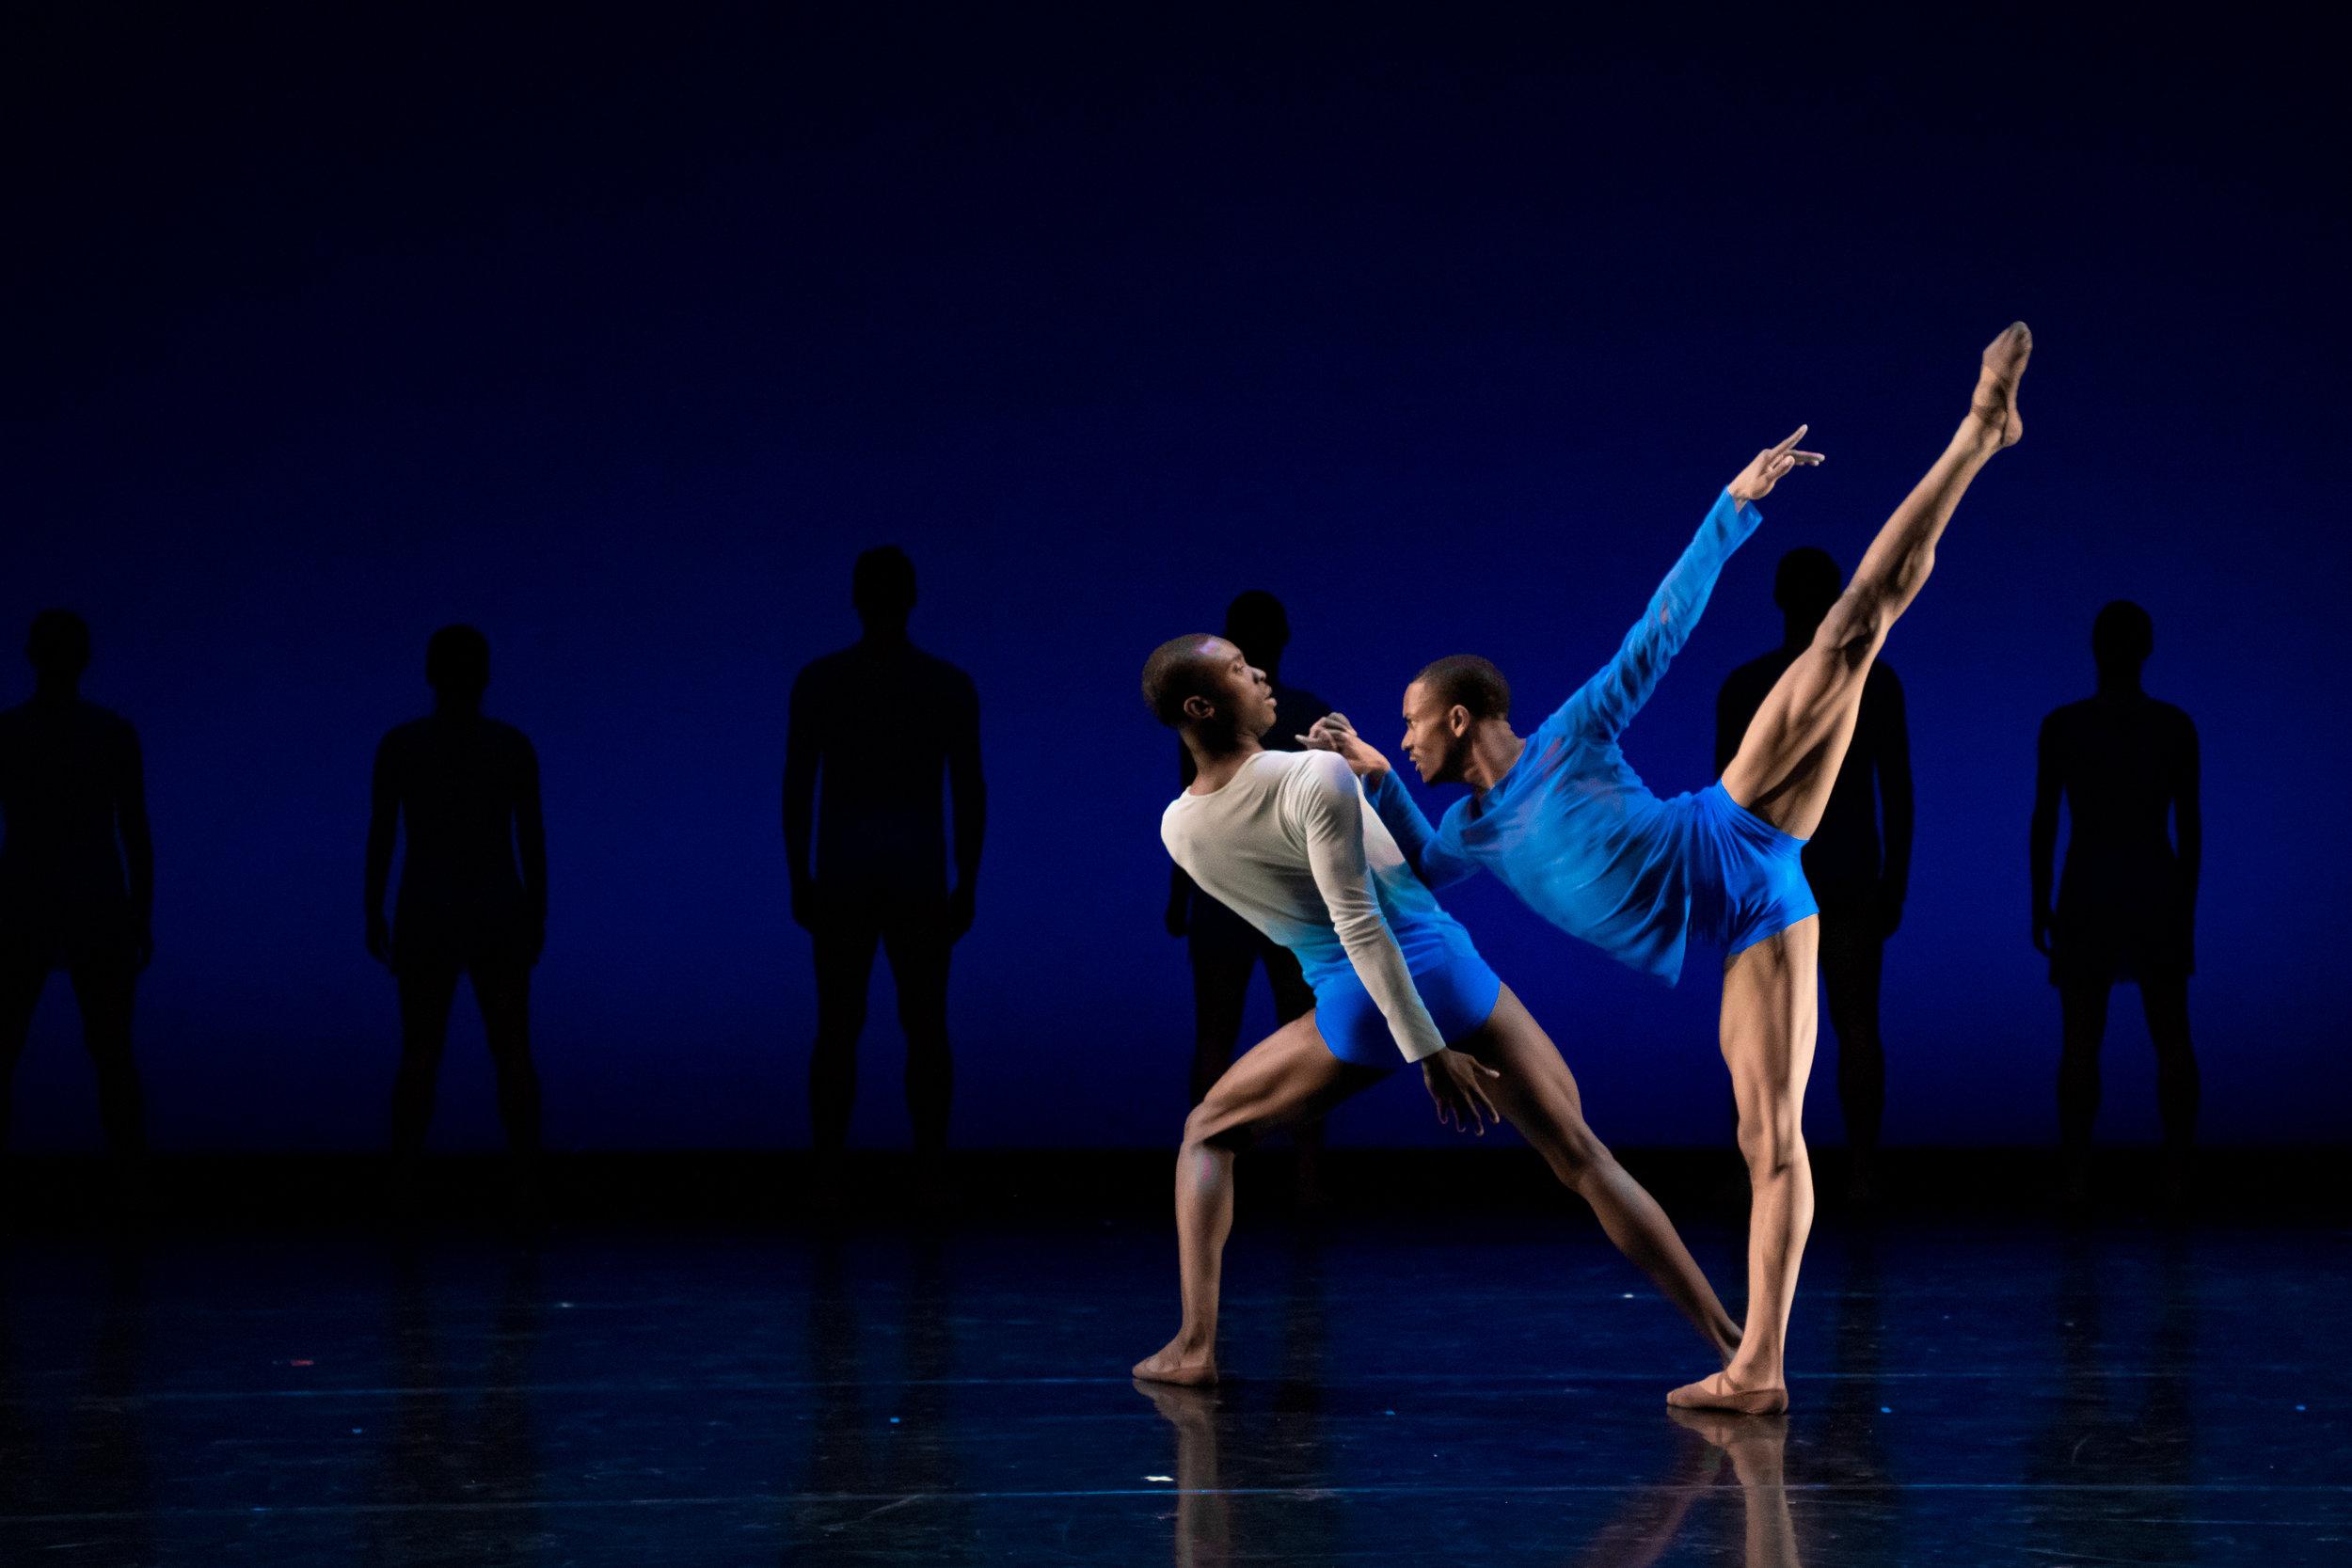 Photography Credits:  YONDER - for BalletX  Choreography: Wubkje Kuindersma  Photographer : Vikki Sloviter  Dancers BalletX: Stanley Glover & Roderick Phifer